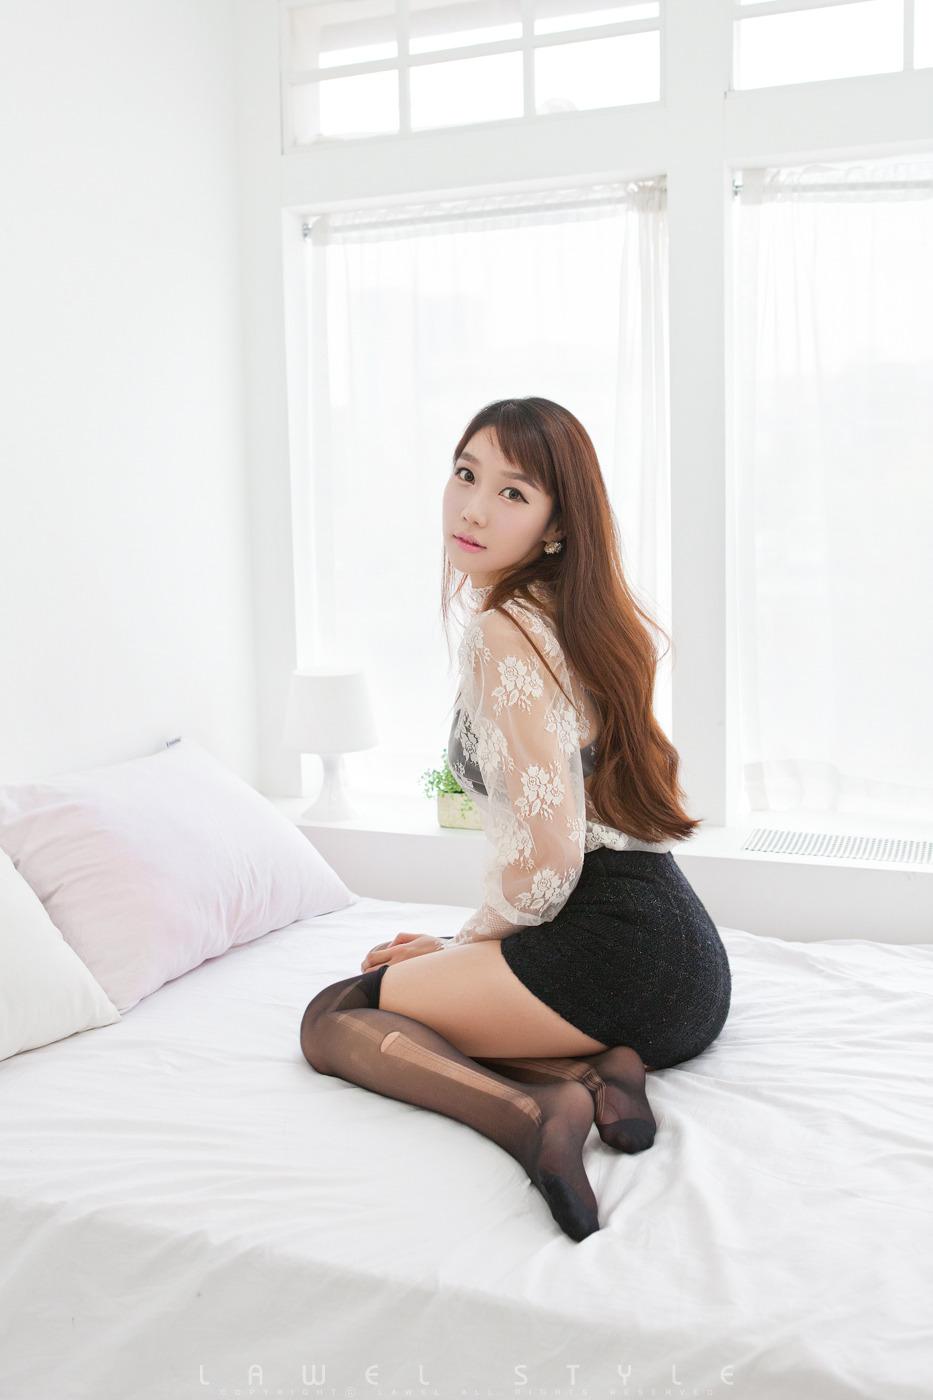 xxx nude girls: Santa Go Jung Ah